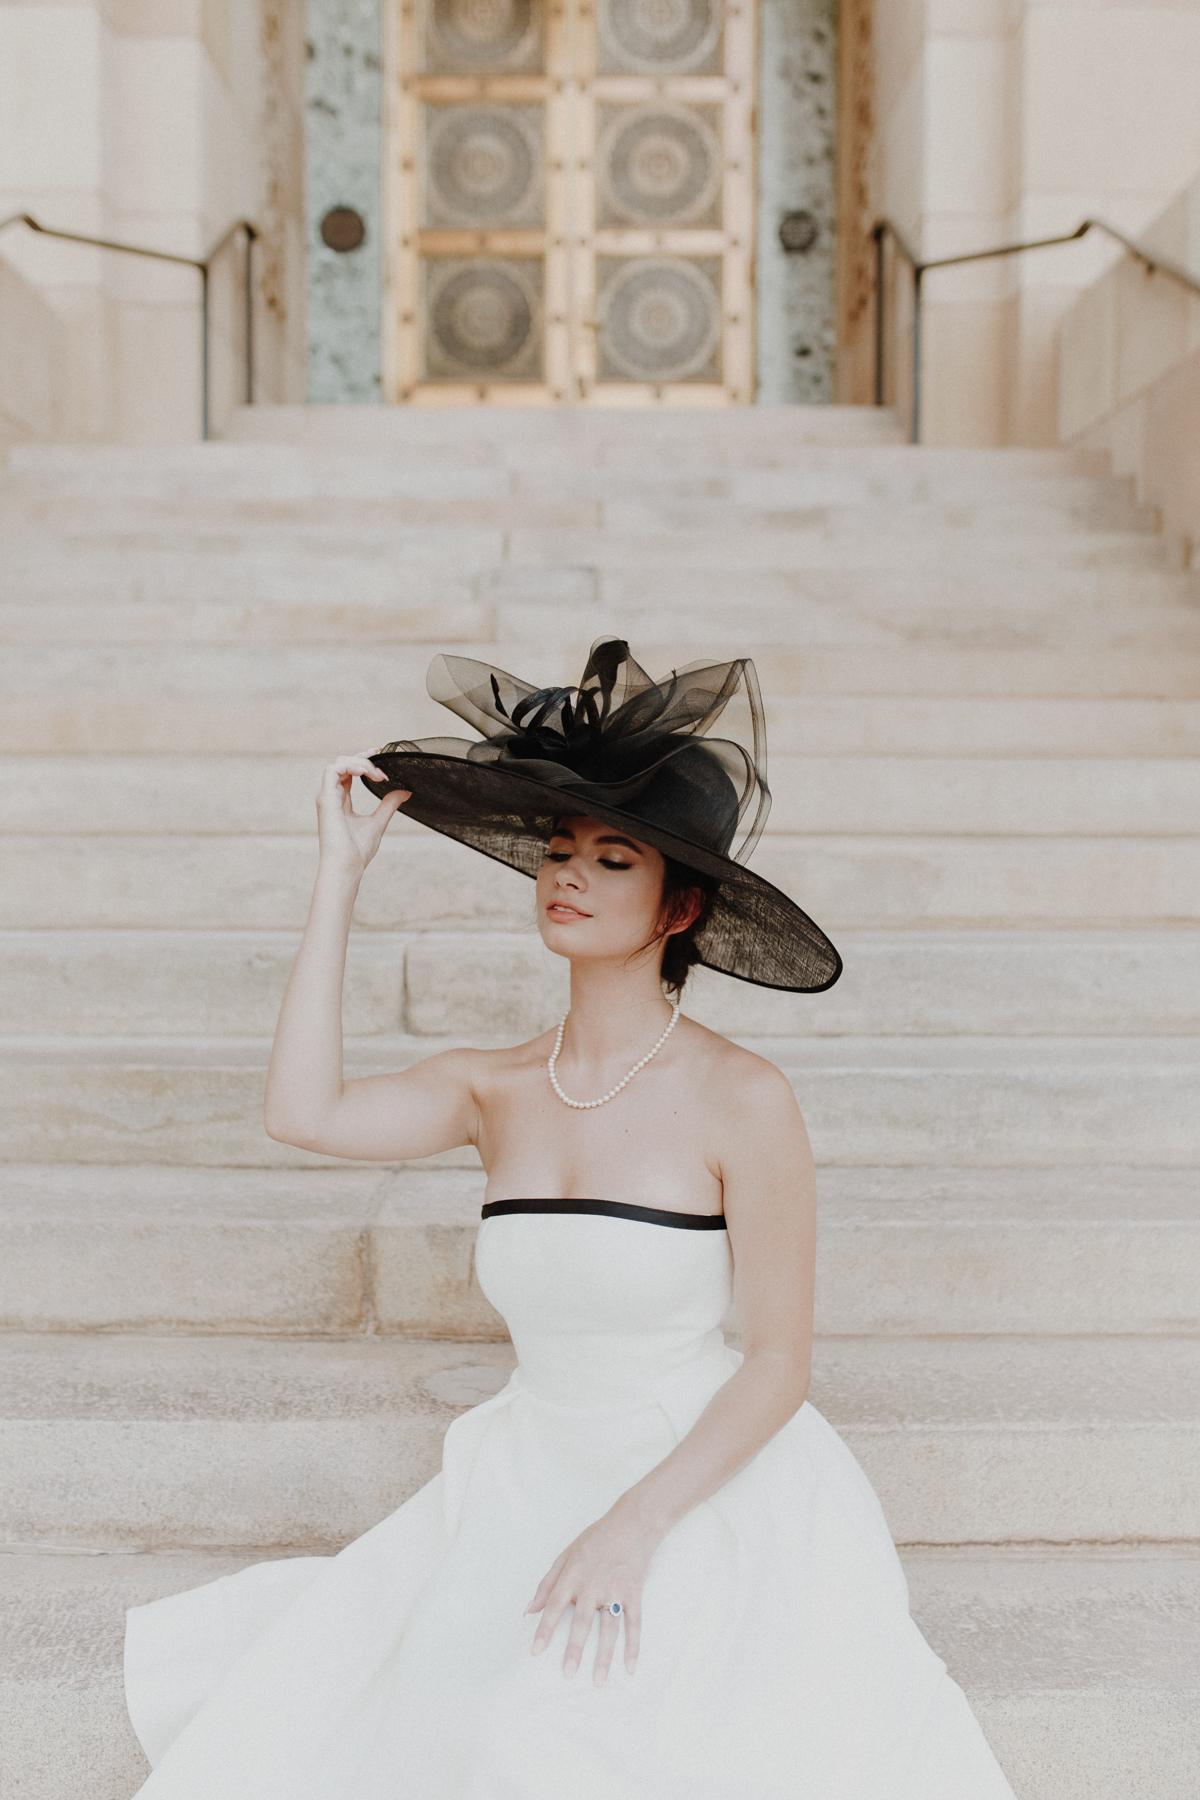 Megan Claire Photography   Phoenix Arizona Courthouse Wedding , Art Deco inspired wedding, vintage inspired wedding, arizona elopement photography, intimate wedding inspiration